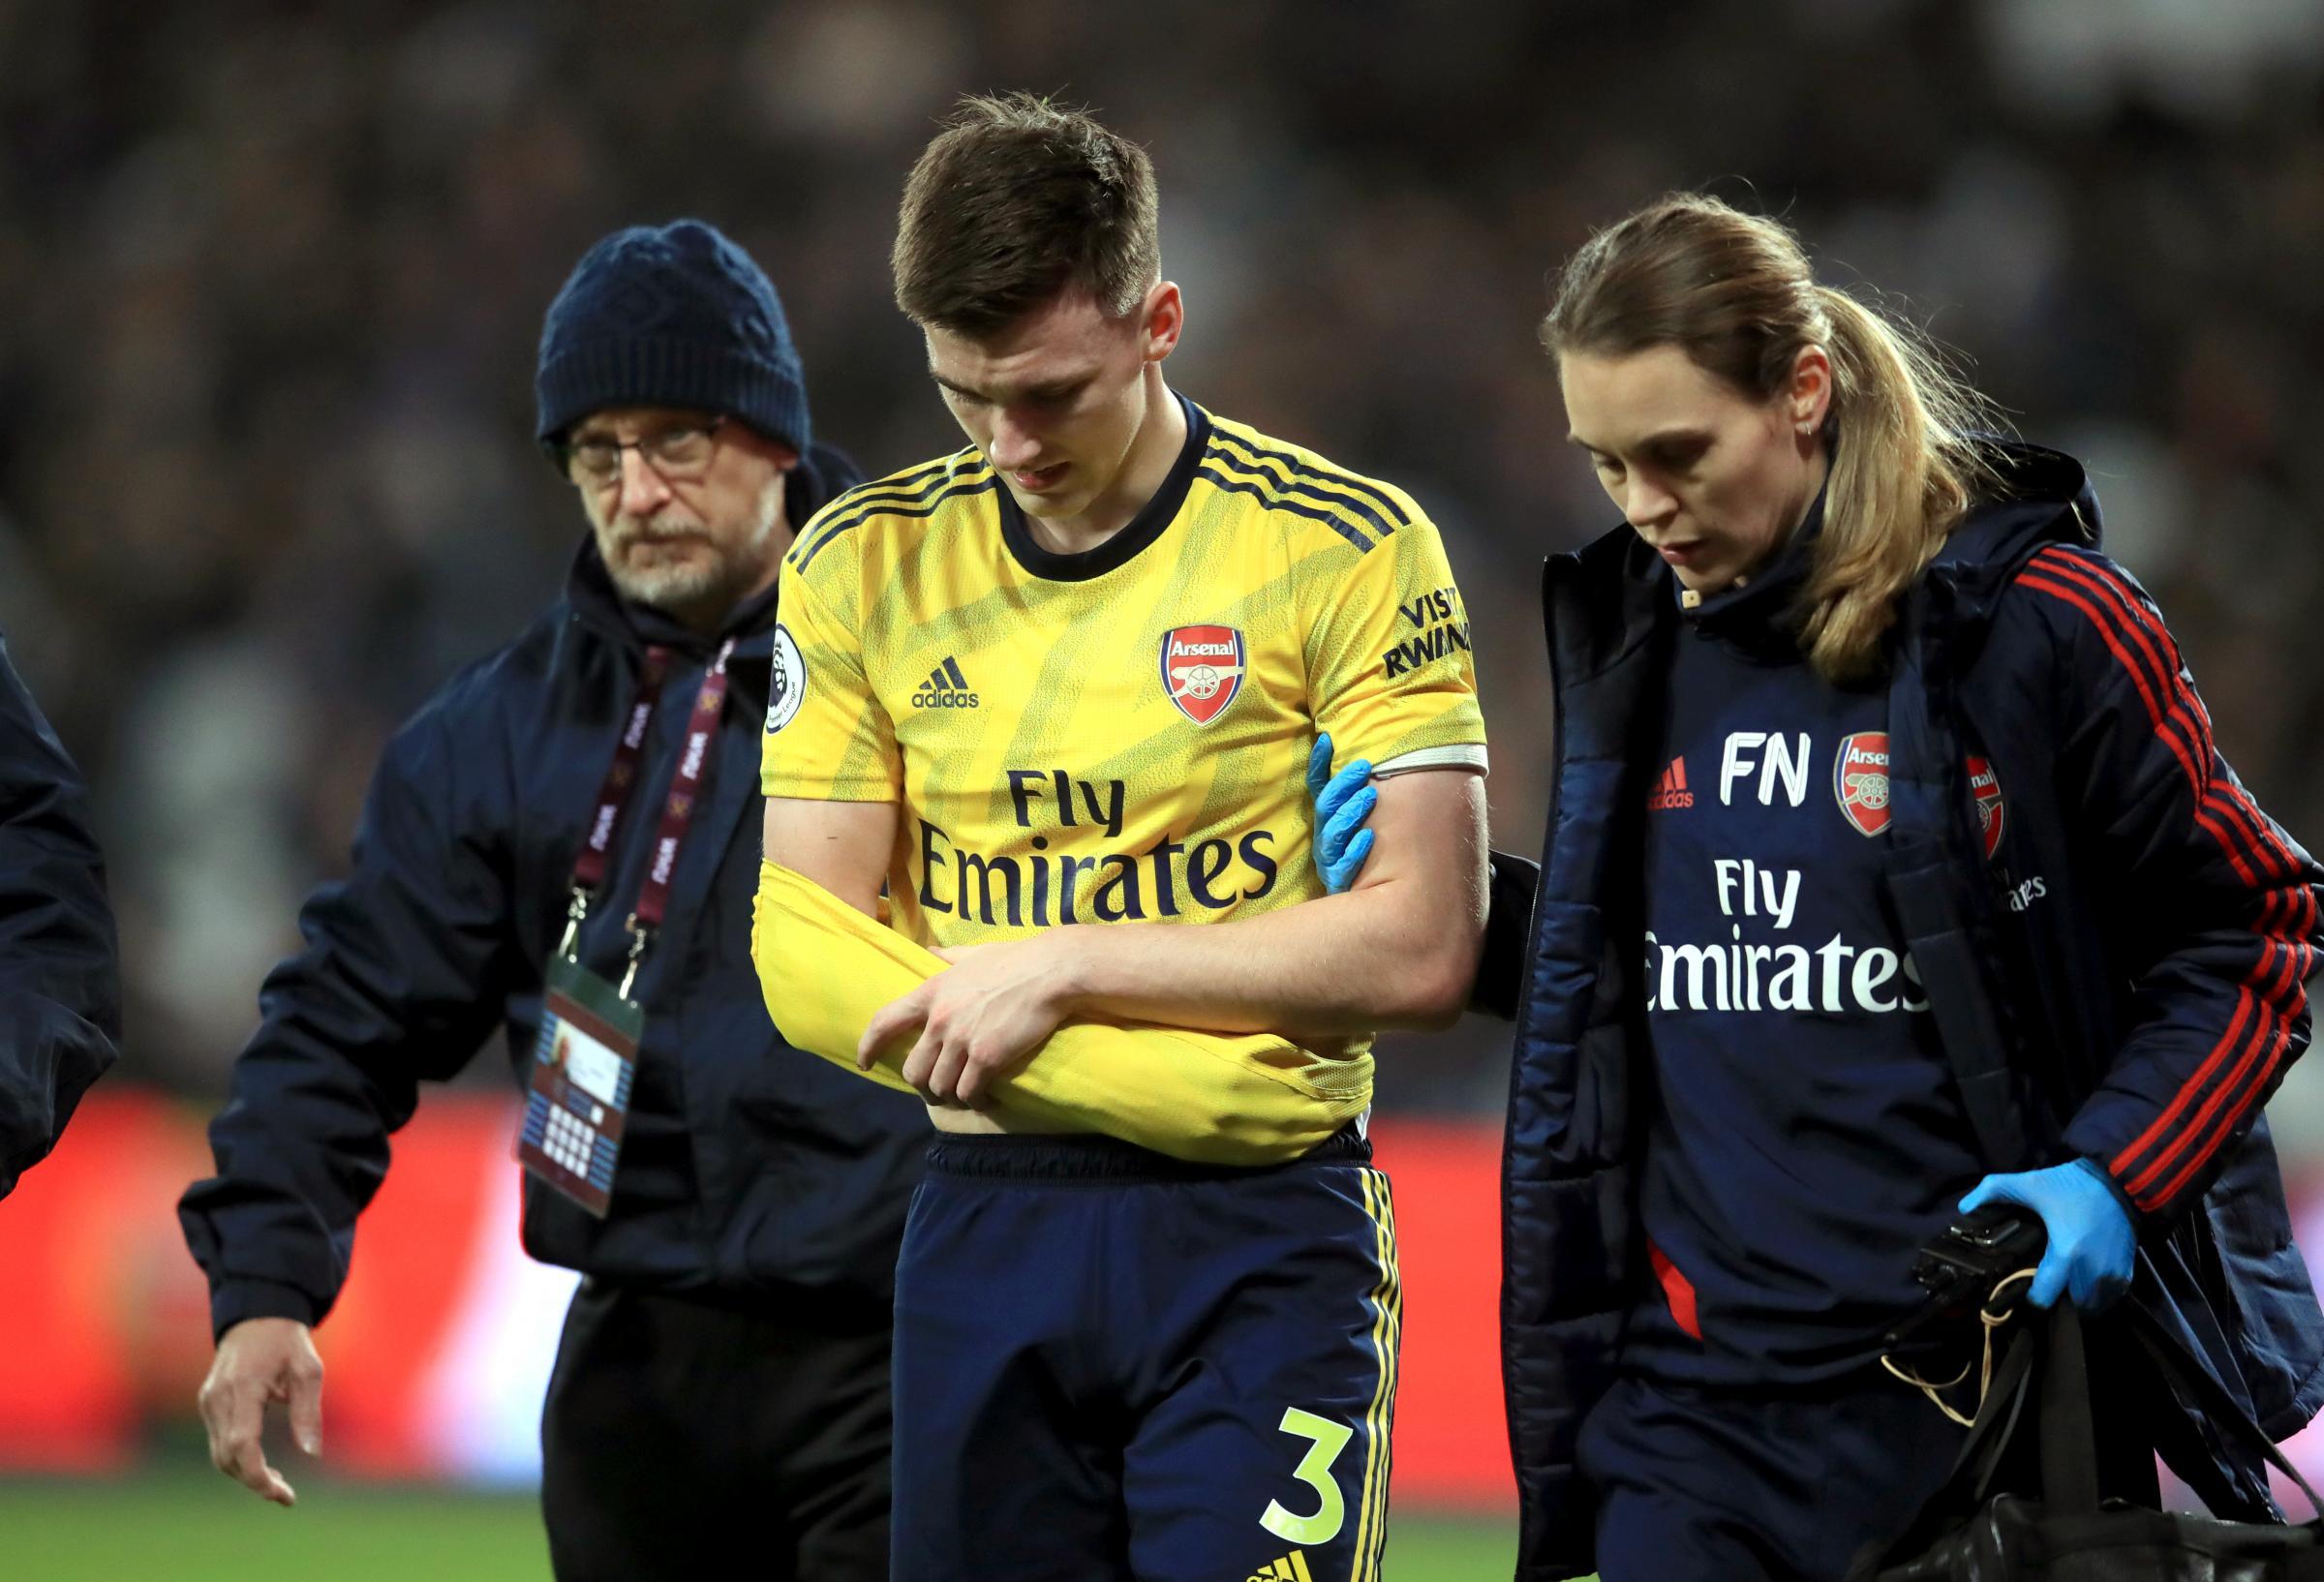 Arsenal's Kieran Tierney well ahead of schedule in return bid after shoulder injury